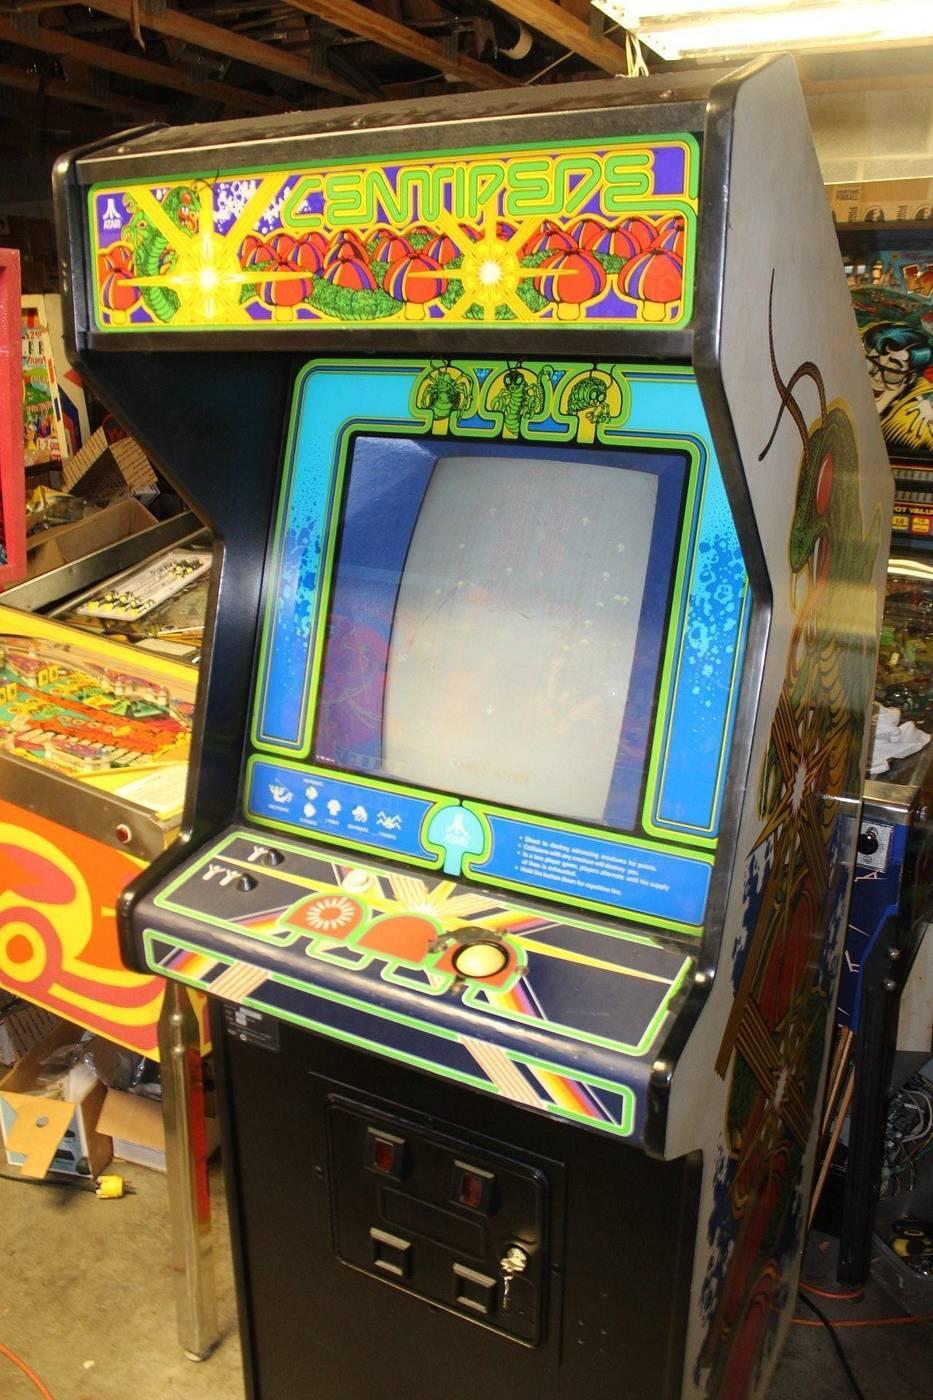 Atari Centipede Full Size Arcade Machine For Sale Pinside Market